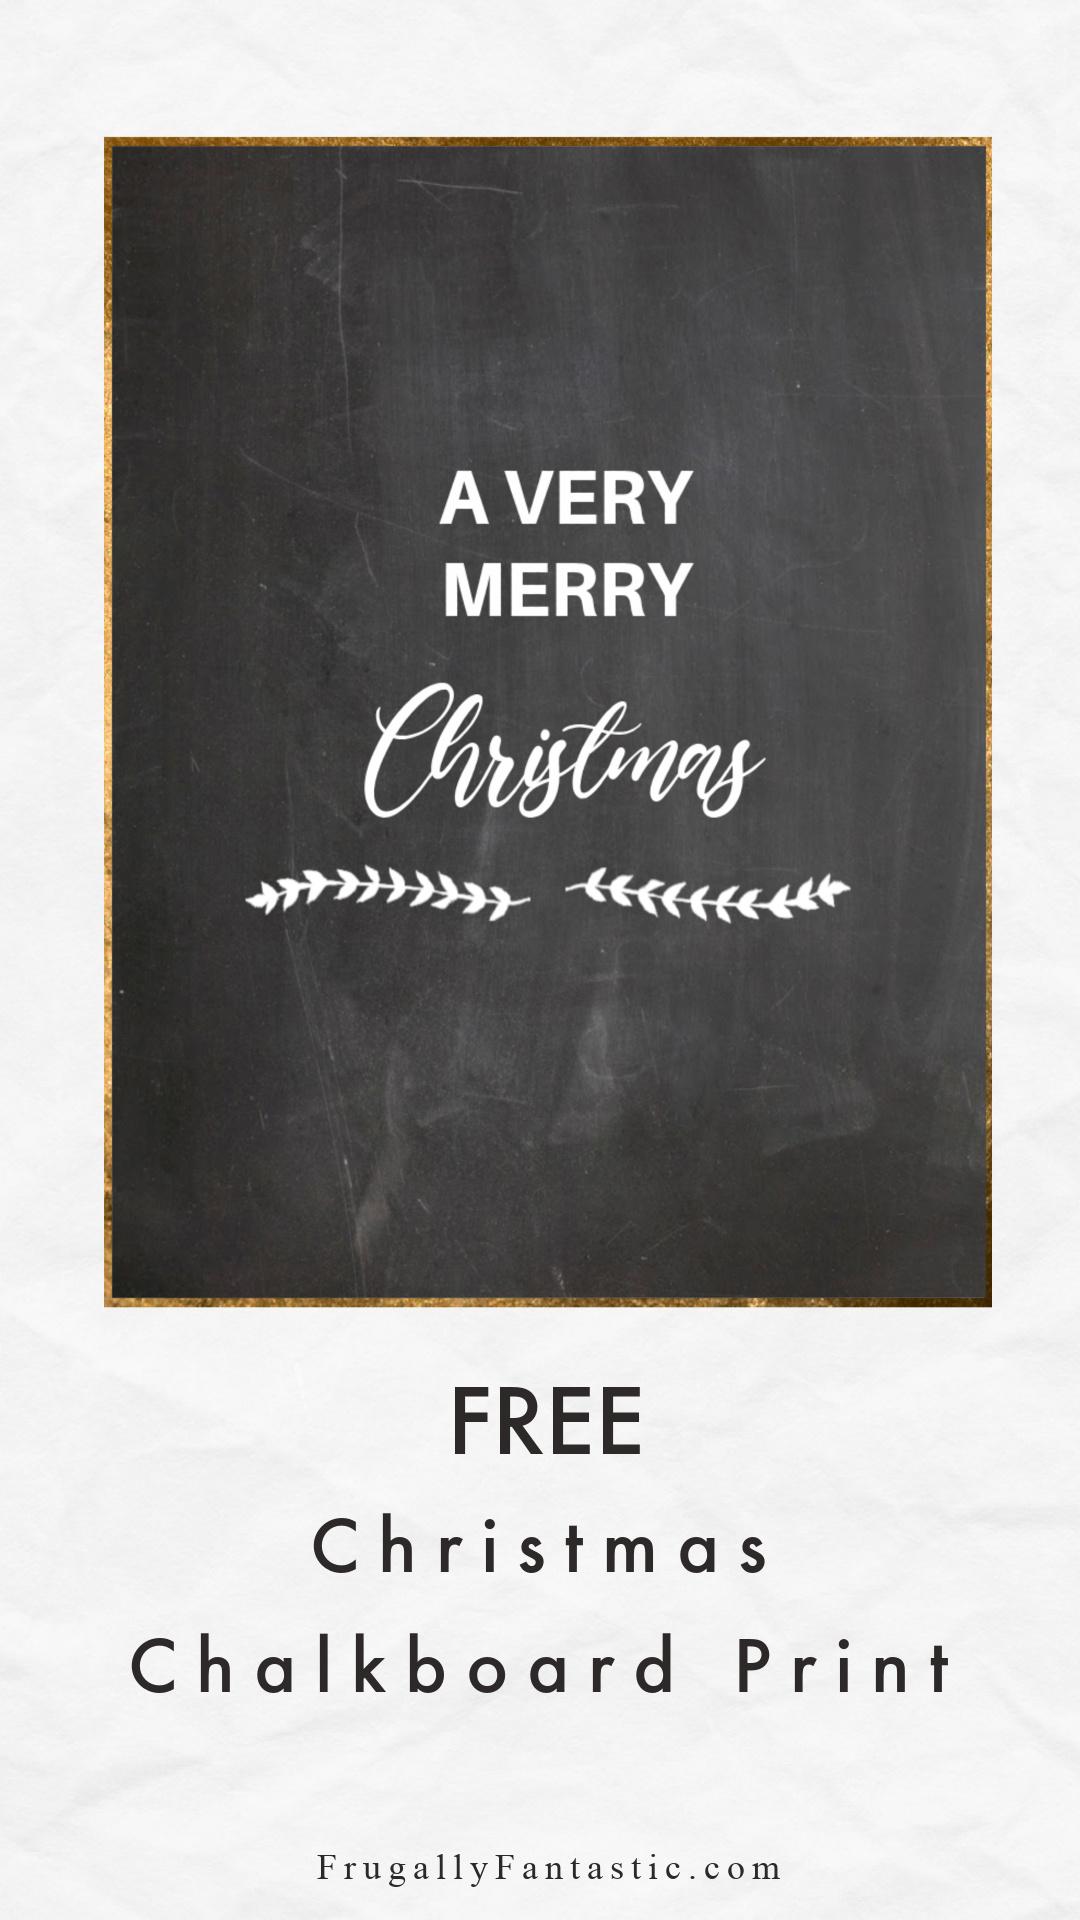 Free Christmas Chalkboard Print FrugallyFantastic.com